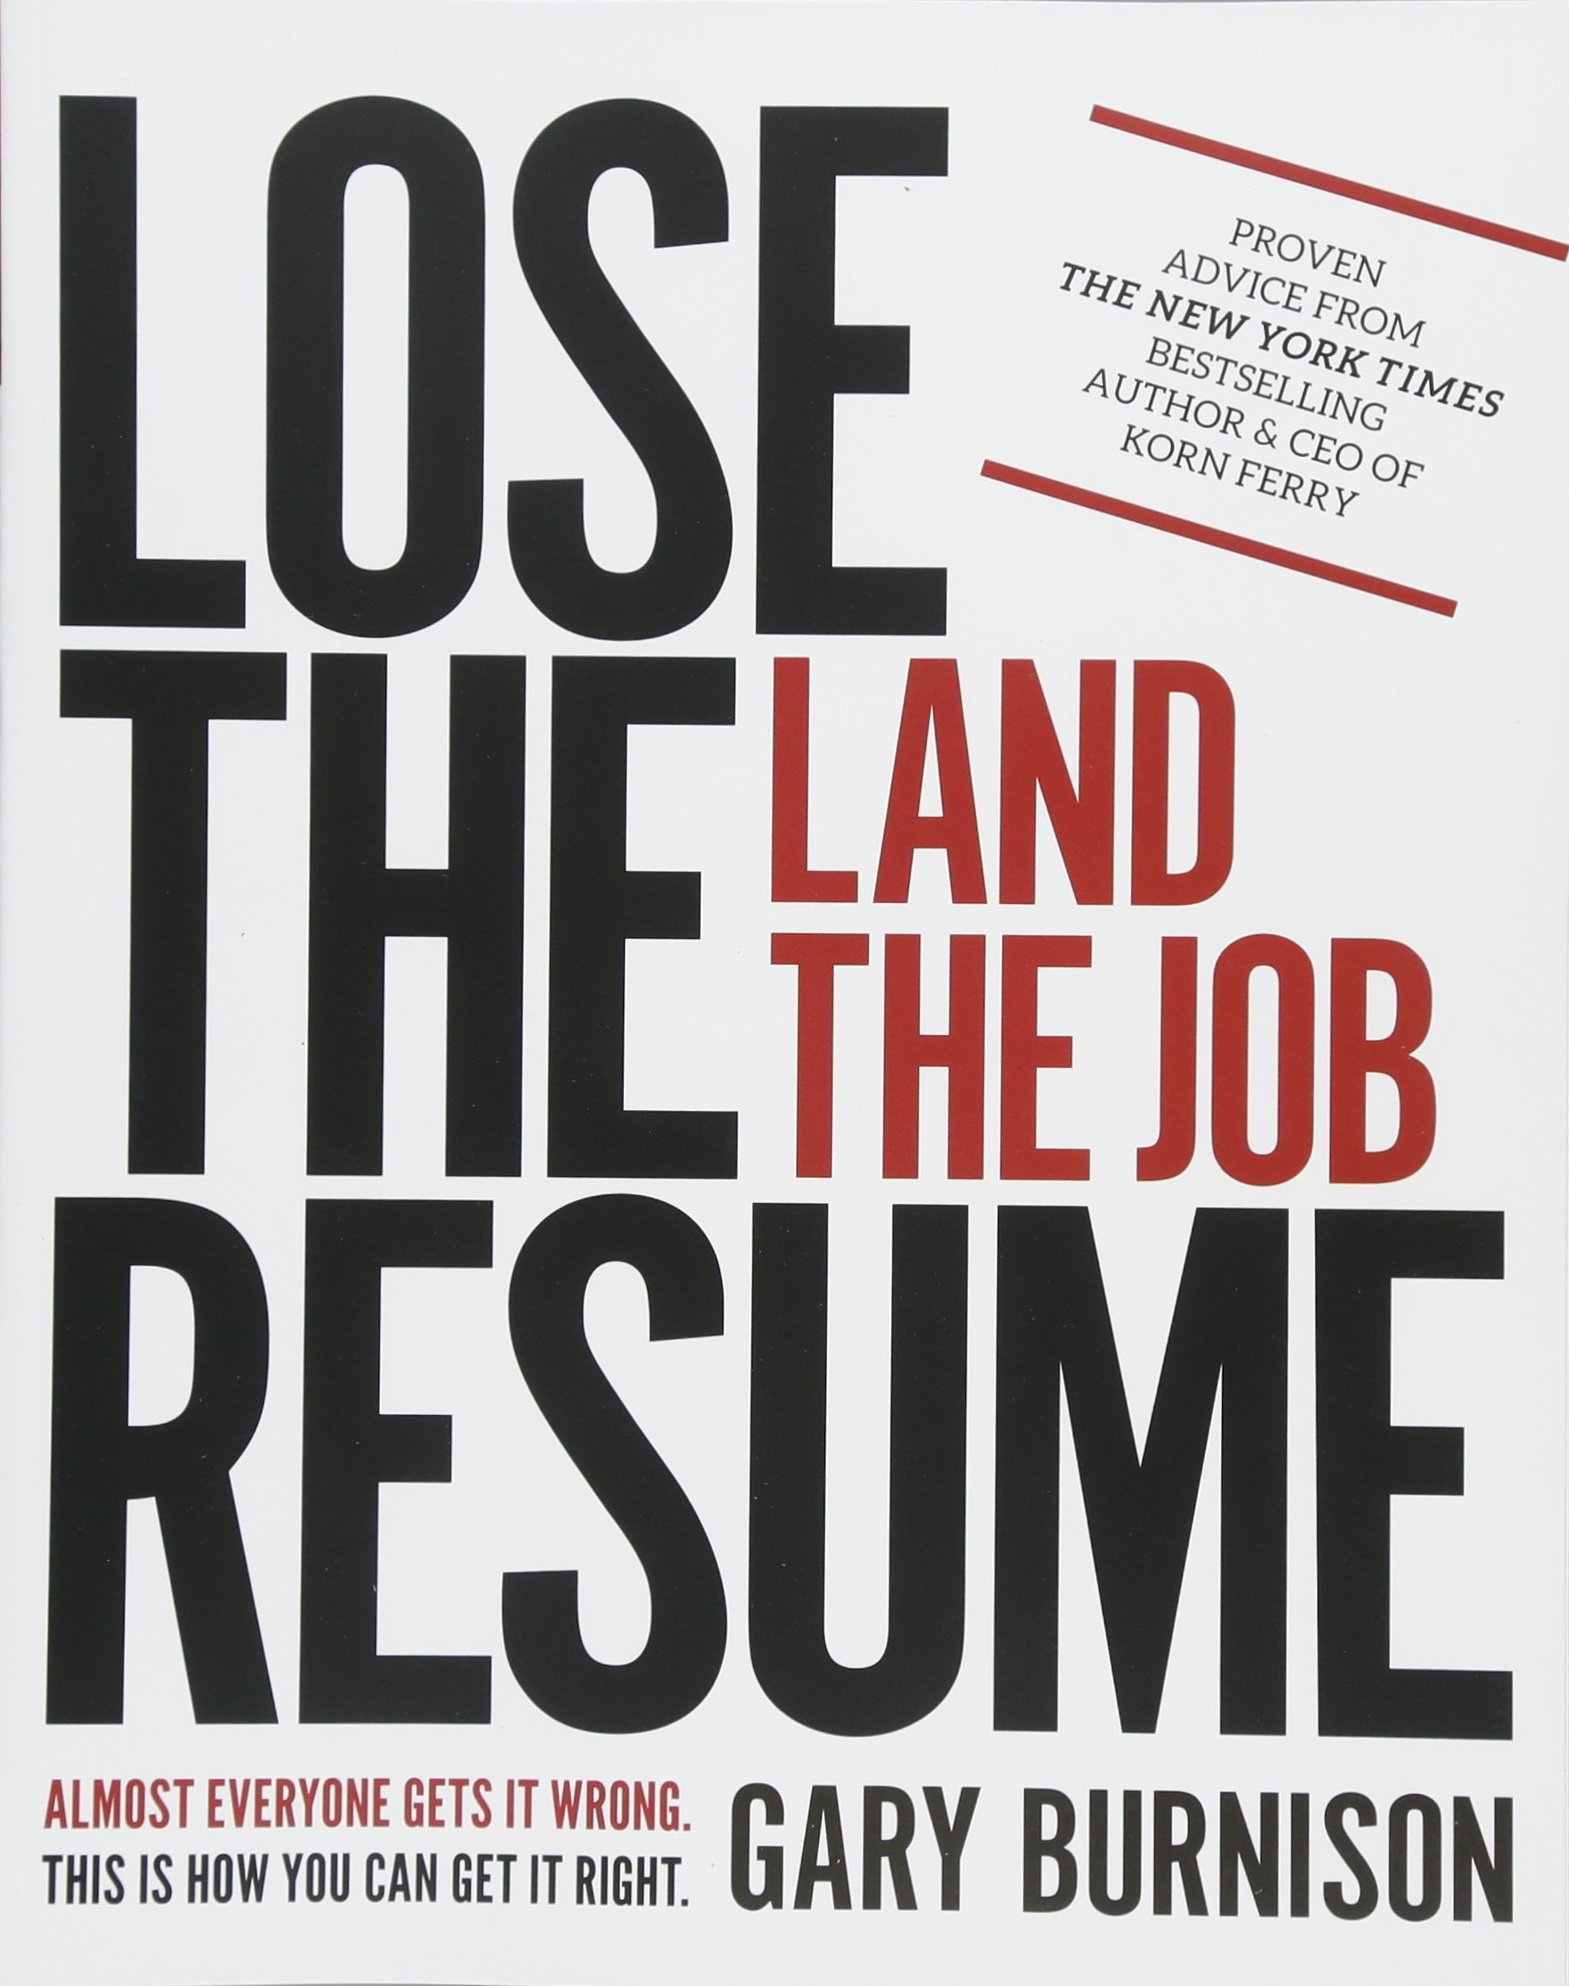 Lose The Resume, Land The Job: Gary Burnison: 9781119475200: Amazon.com:  Books